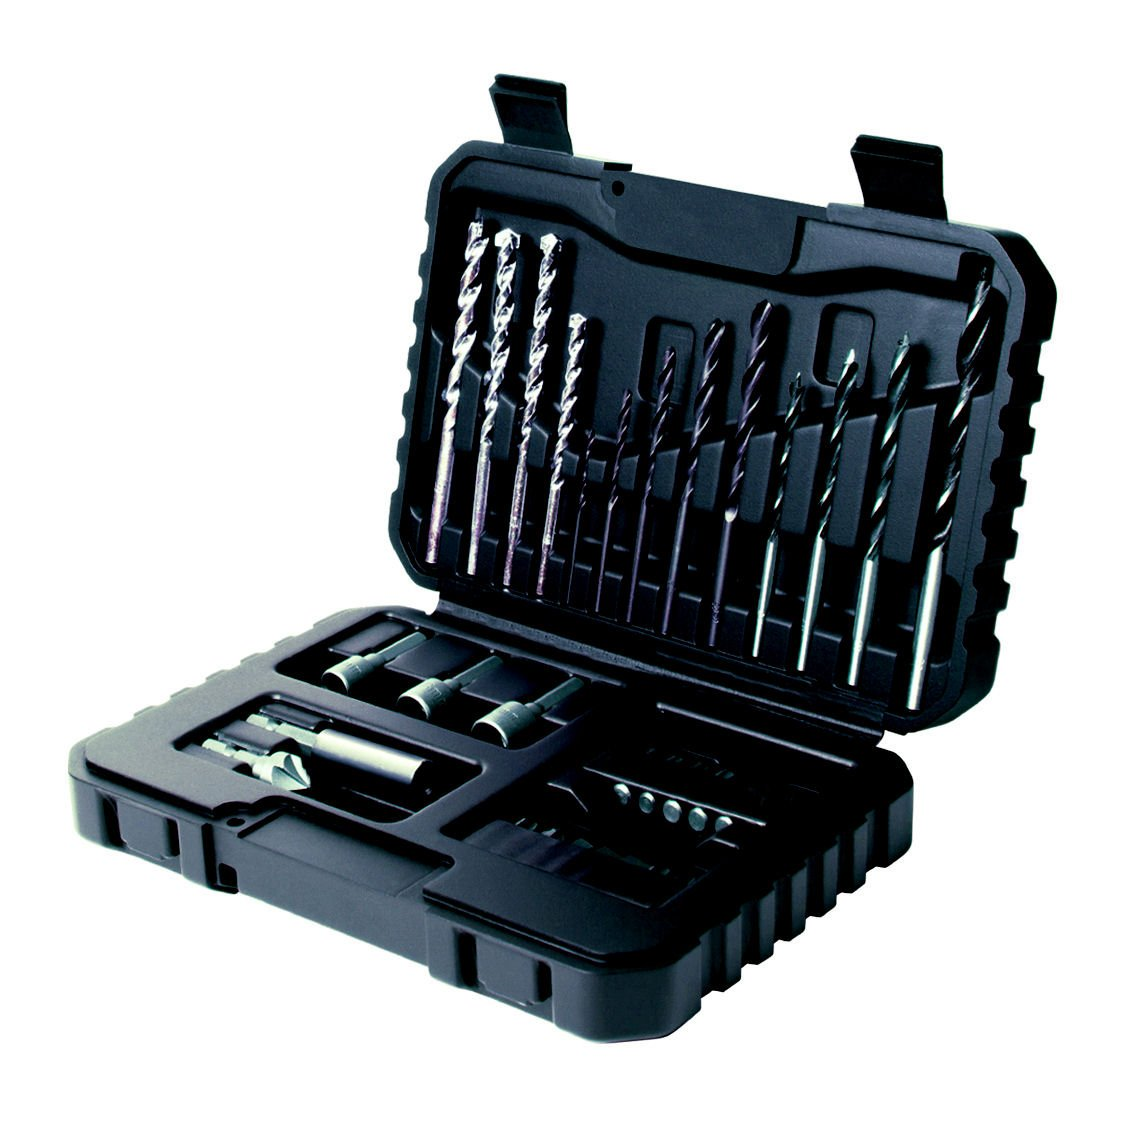 Black+Decker A7216-XJ Kit de 32 Piezas para taladrar y atornillar StanleyBlack&Decker